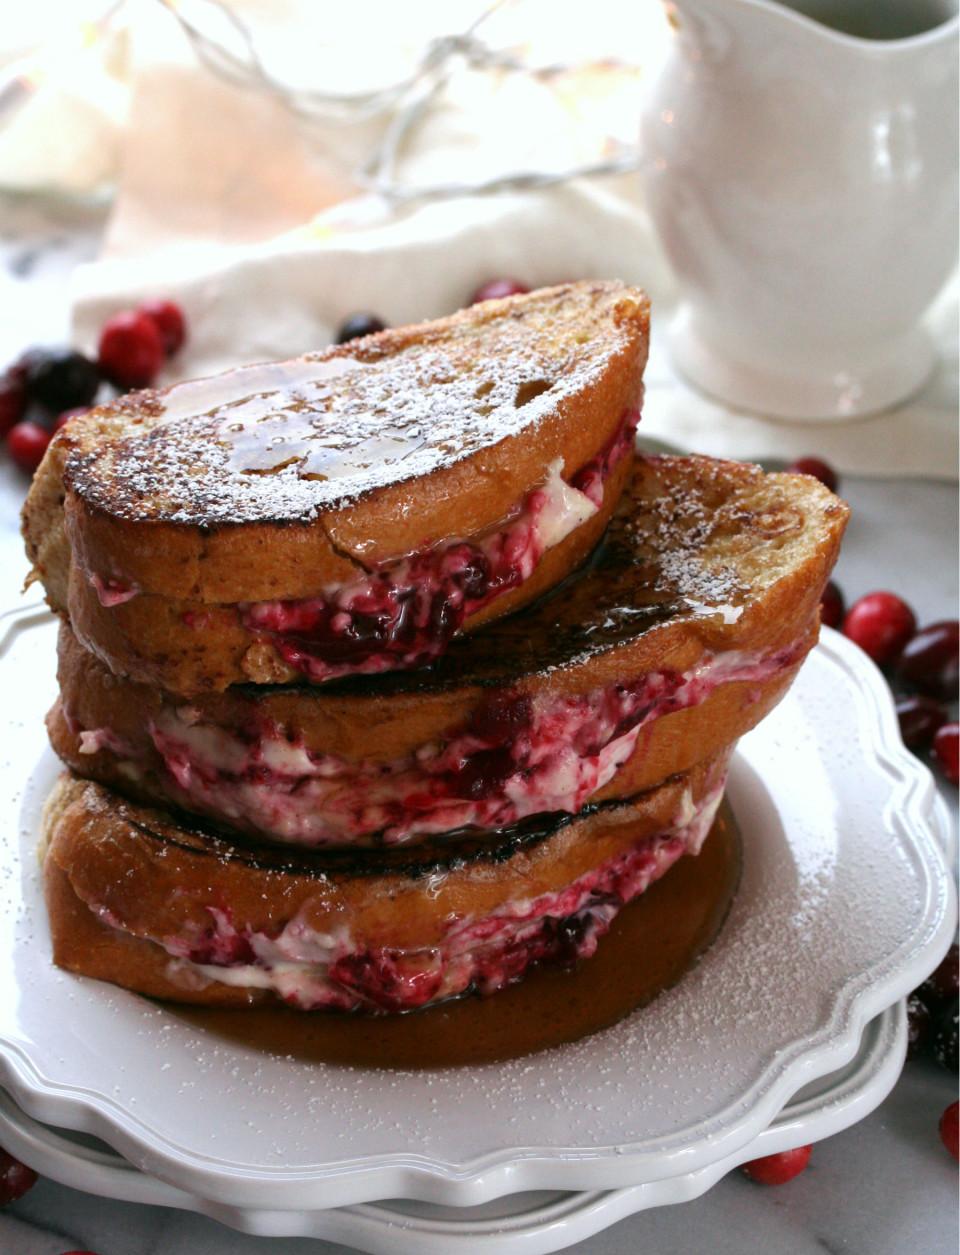 Cranberry Stuffed French Toast | Dash of Savory